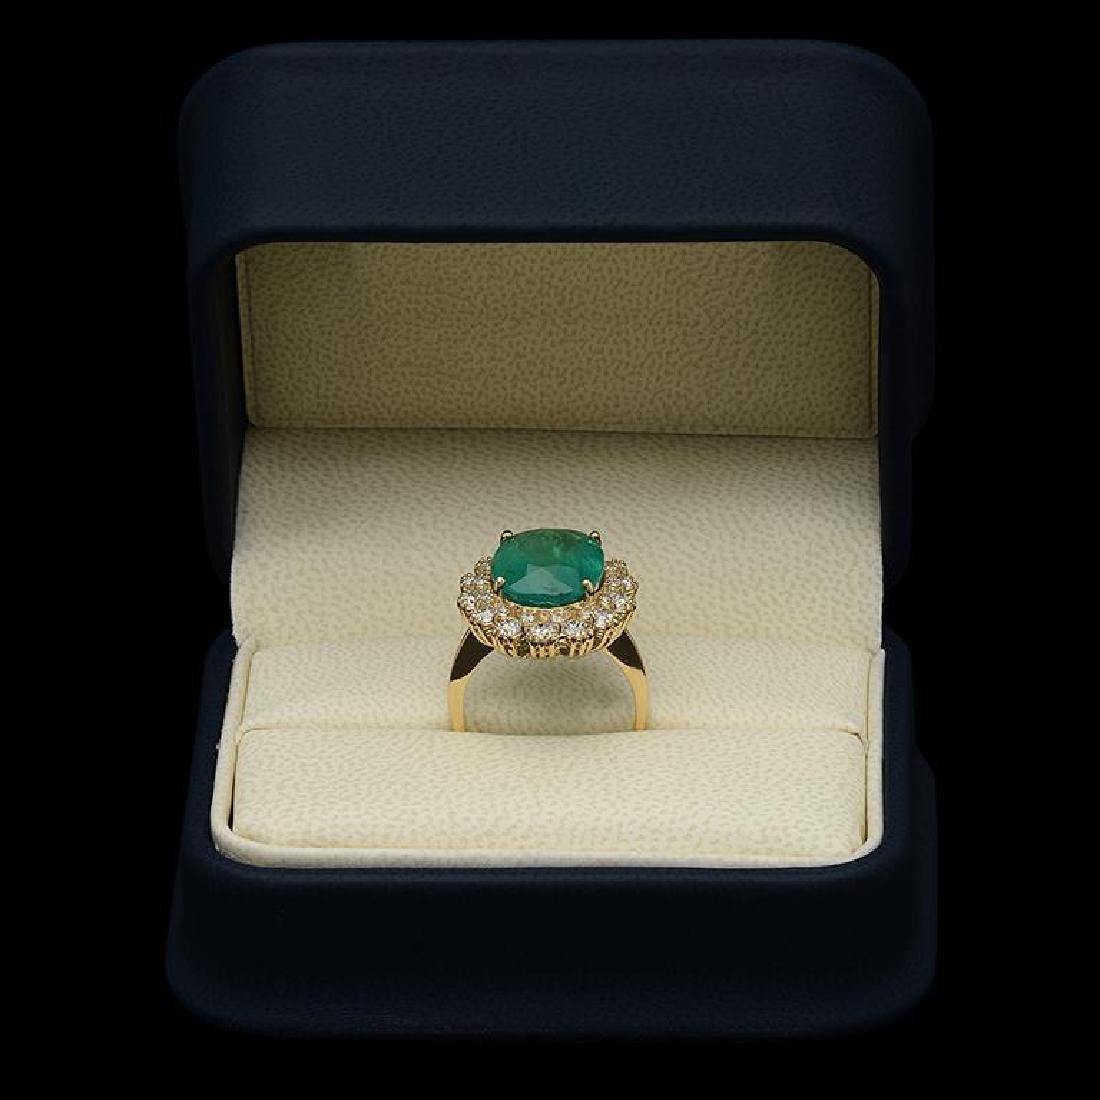 14K Gold 6.80ct Emerald 1.42ct Diamond Ring - 3